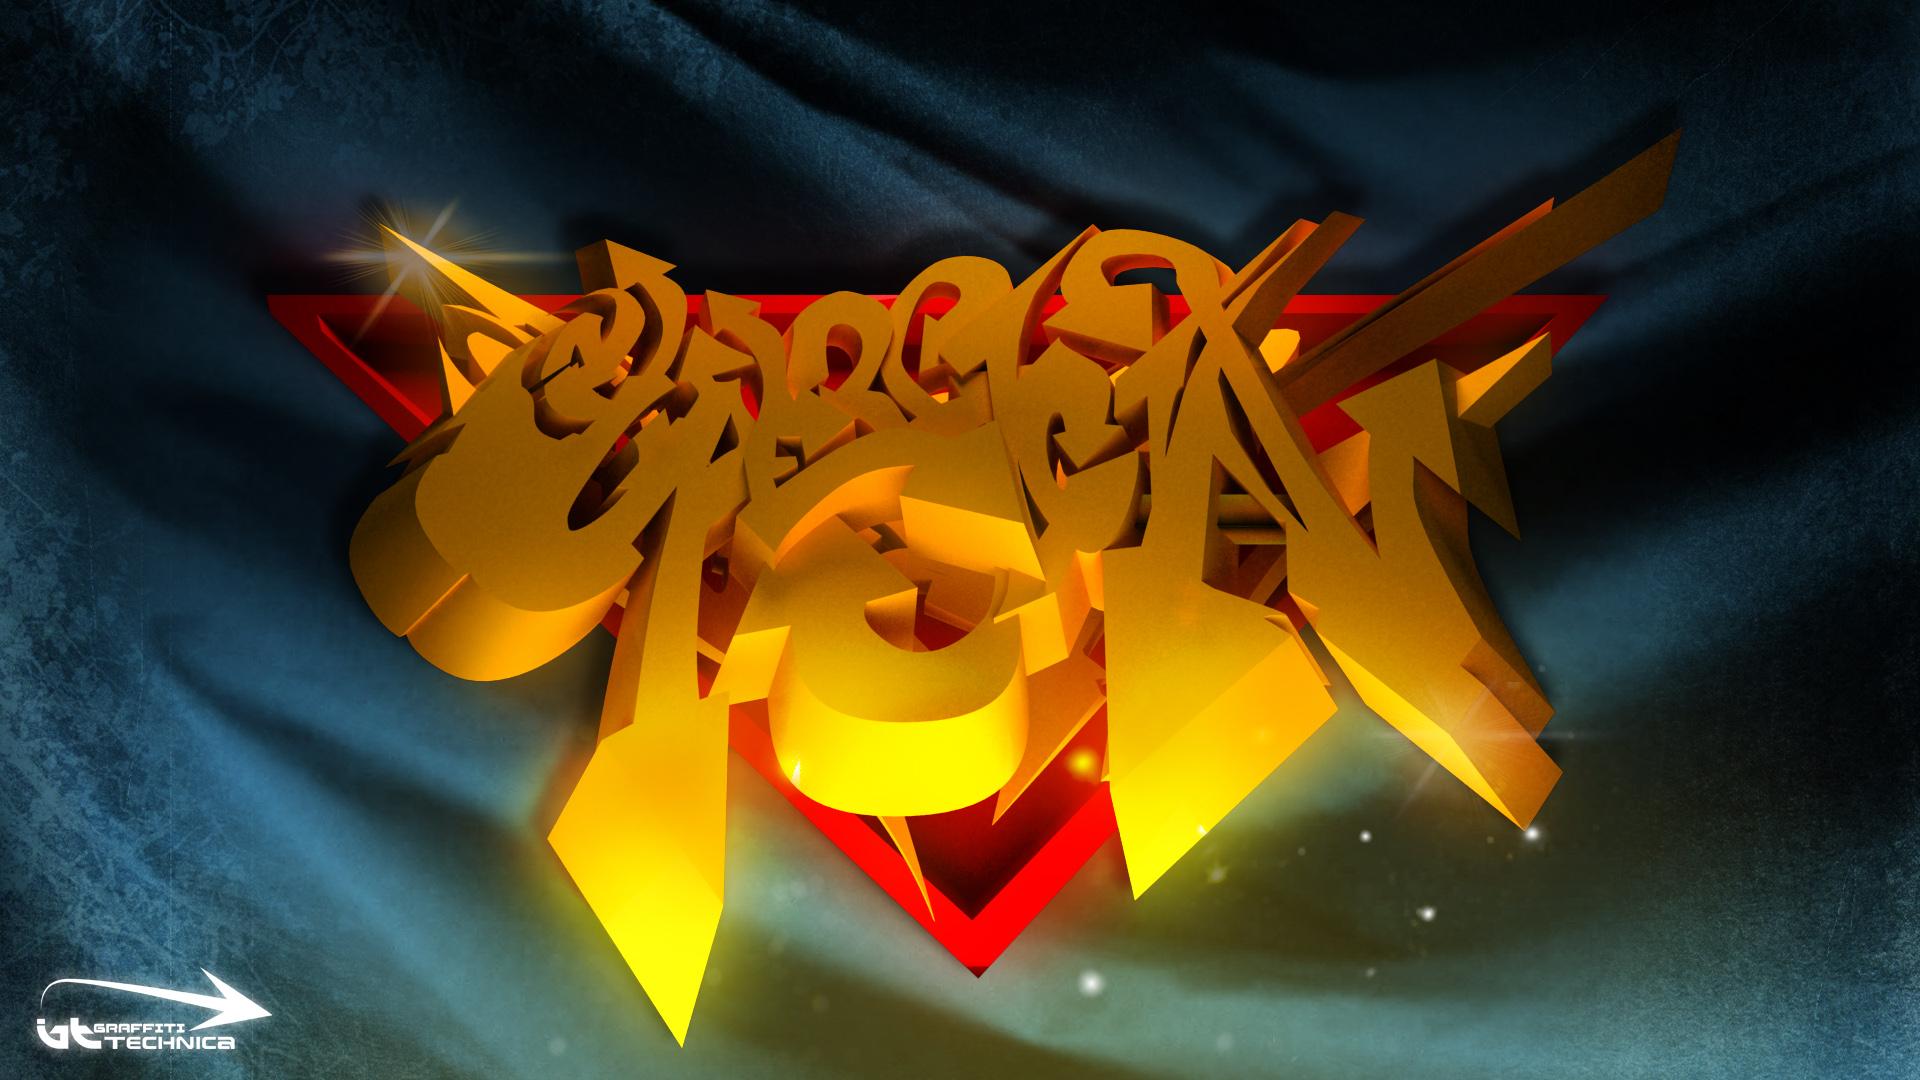 Download Cool Graffiti Wallpaper 1080p 1920x1080